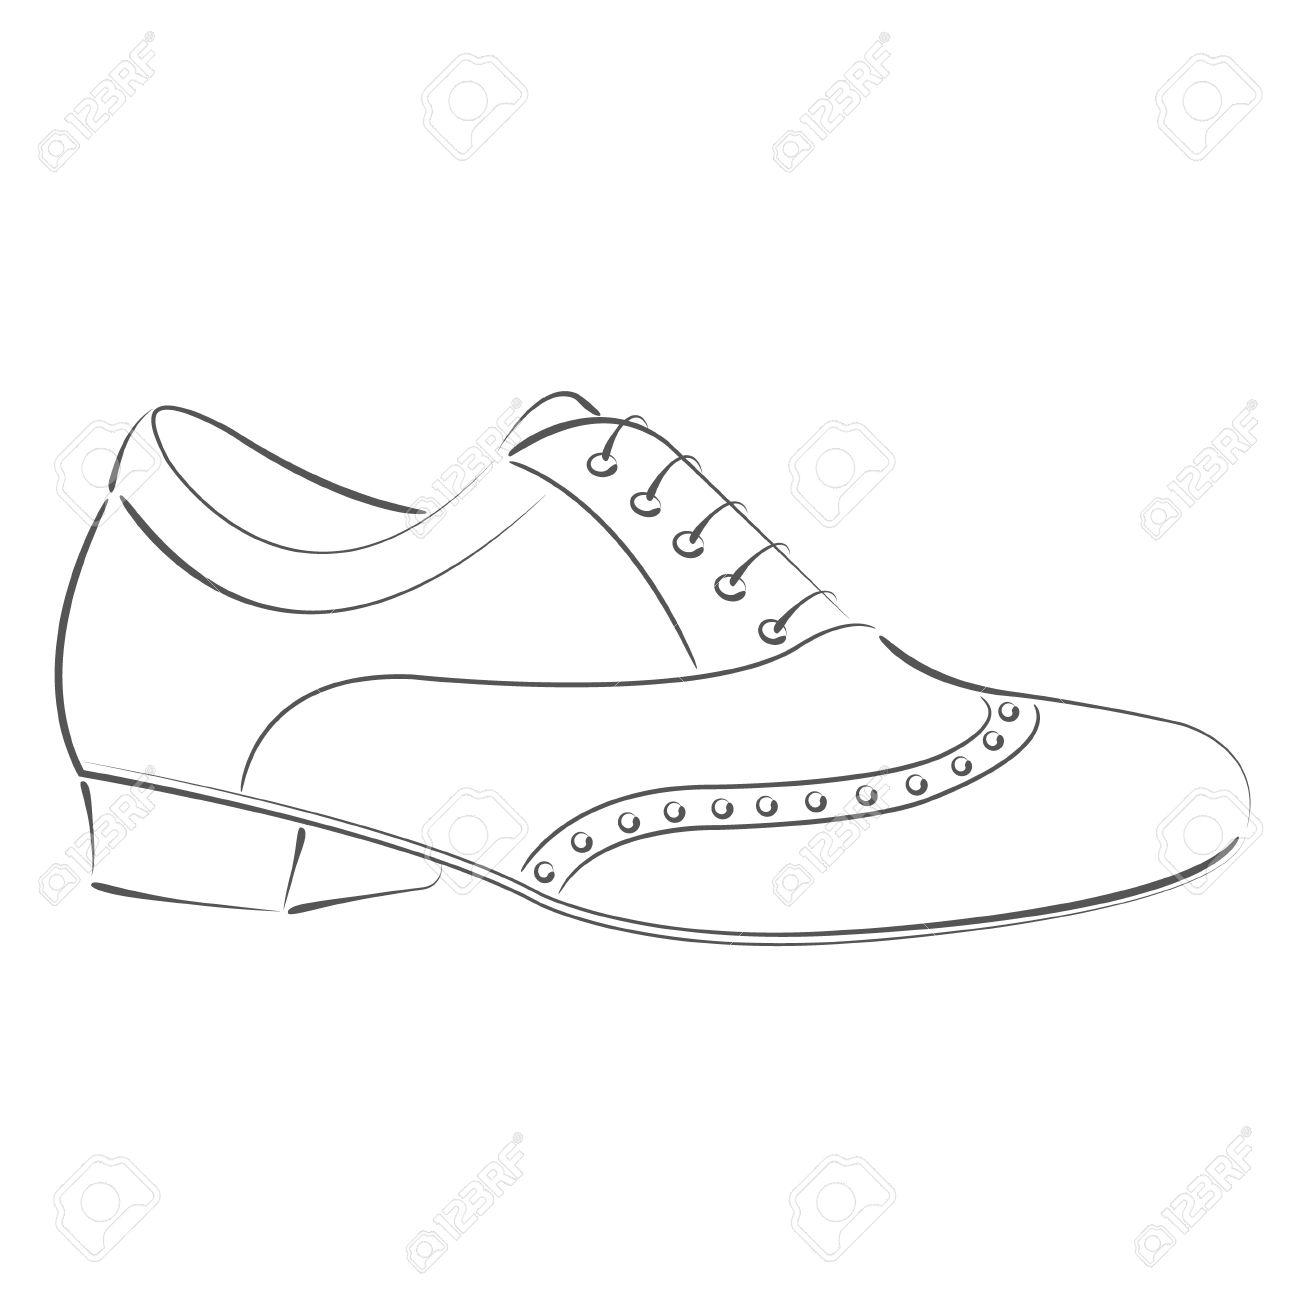 1300x1300 Elegant Sketched Man's Shoe. Argentine Tango Dance Shoes. Design